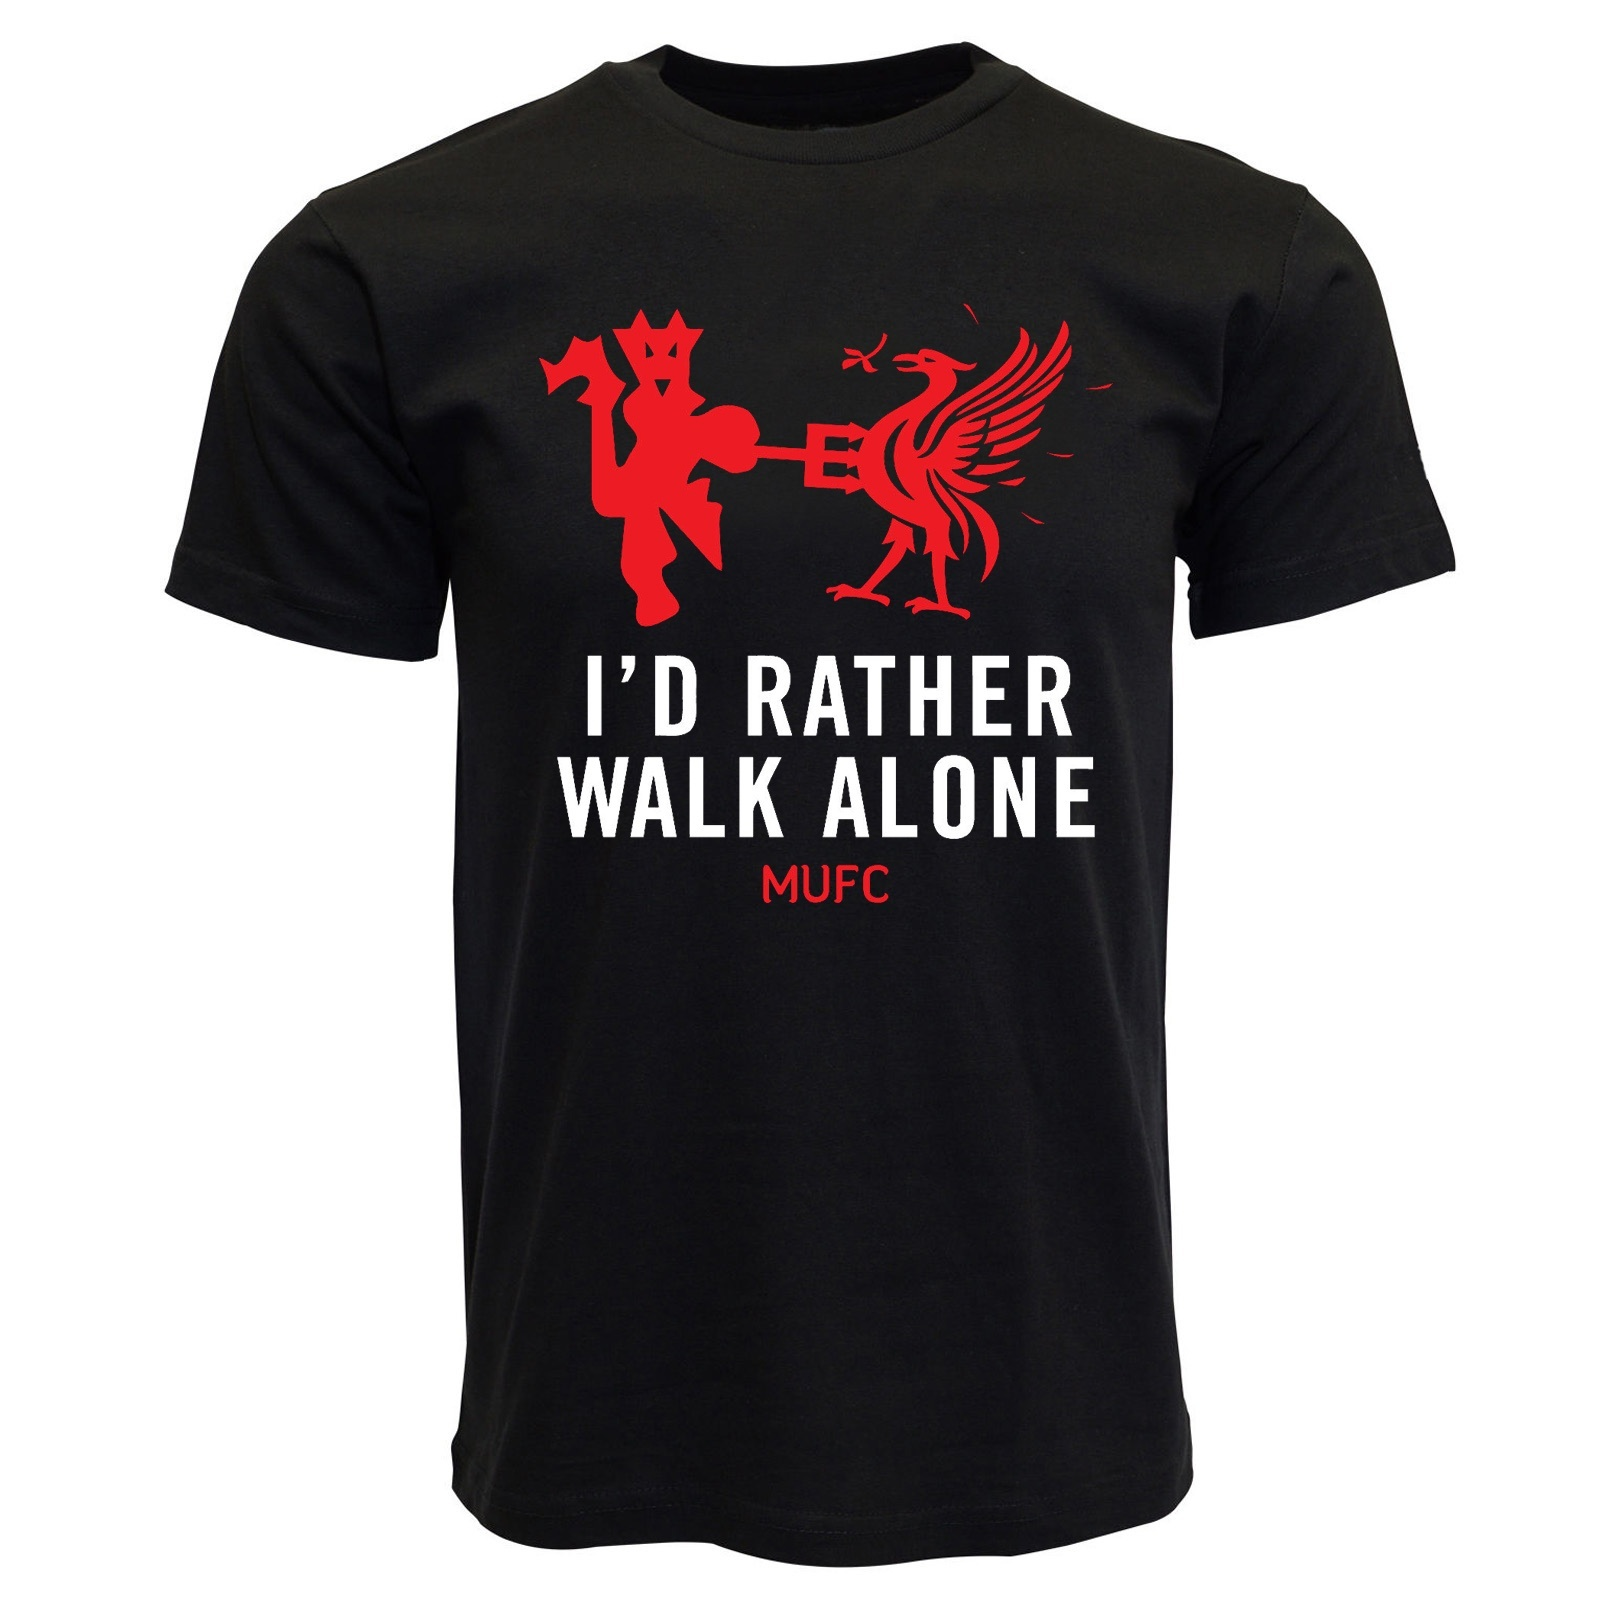 I'd Rather Walk Alone Manchester United Mens   T     Shirt   Graphic Tee Cotton   Shirts   Casual Tops,Football Soccer Man U Pogba Lukaku